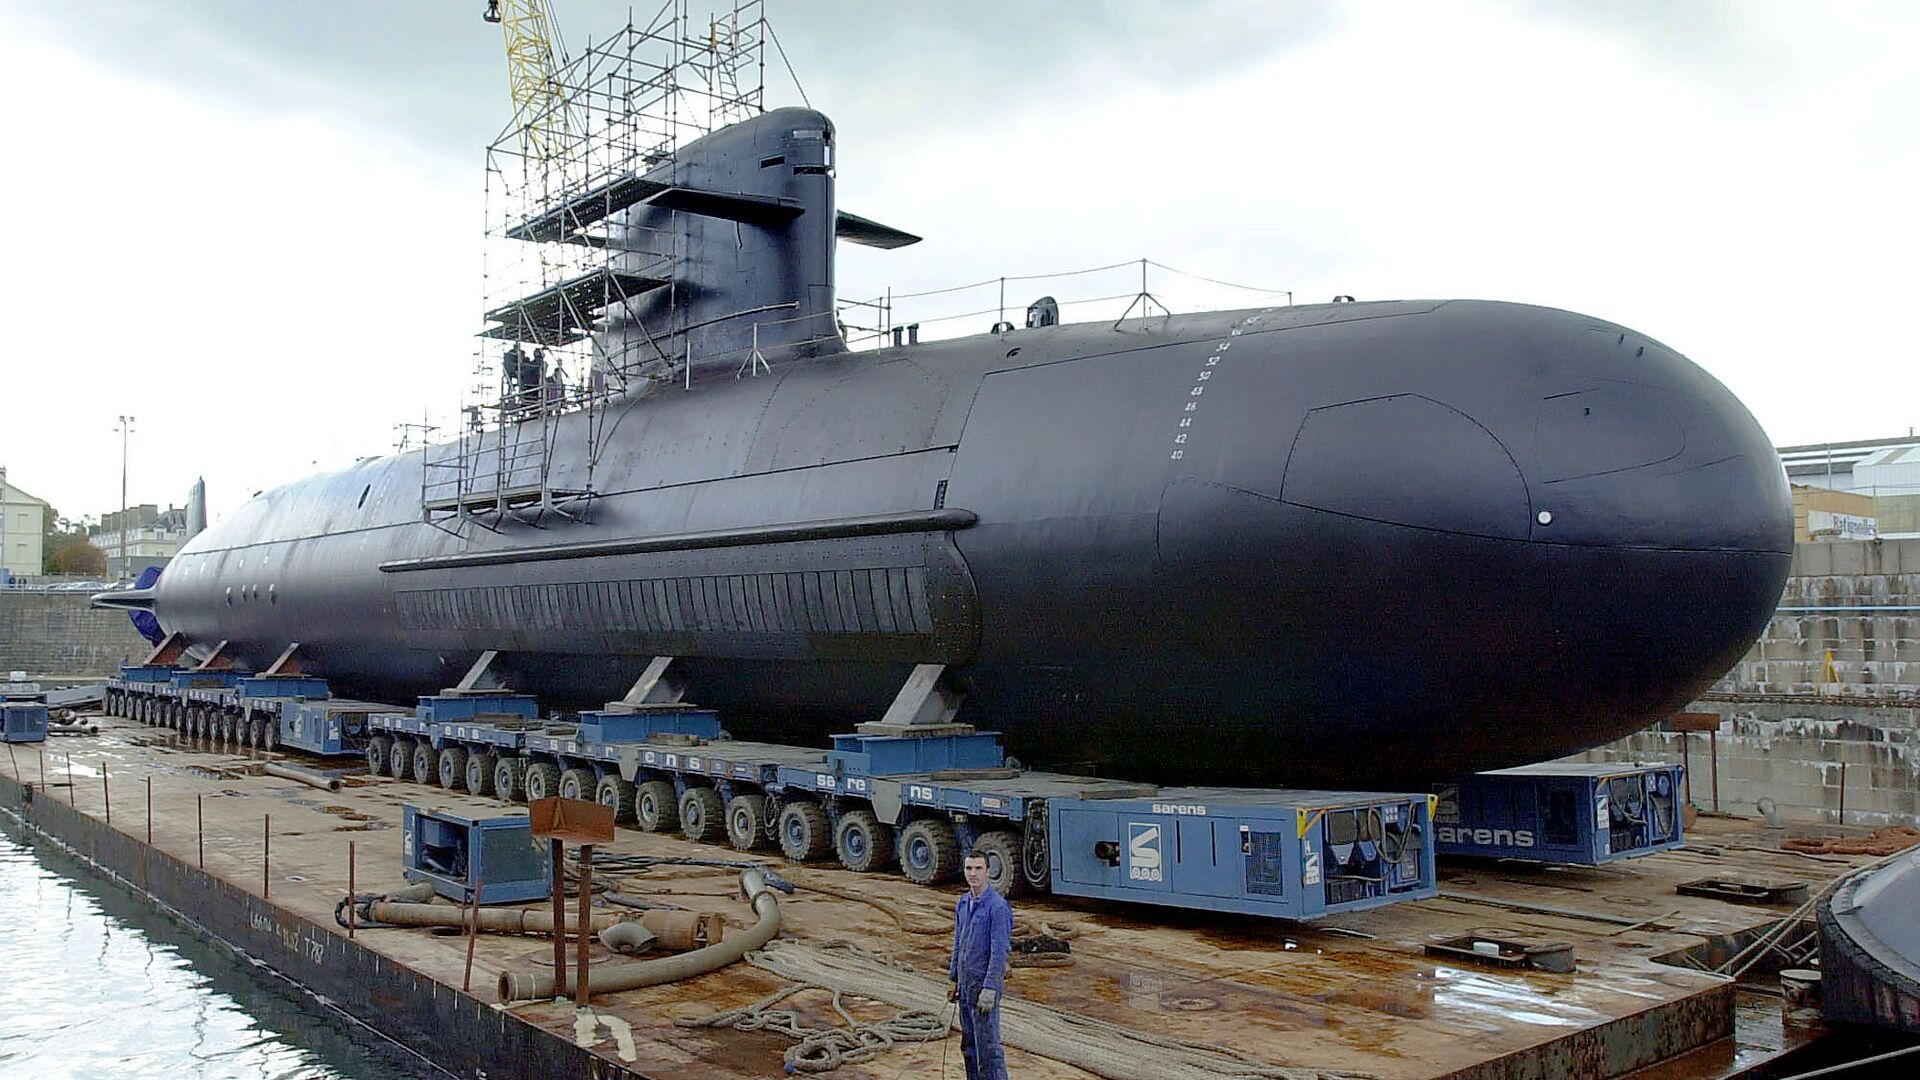 Un submarino francés (imagen referencial) - Sputnik Mundo, 1920, 17.09.2021